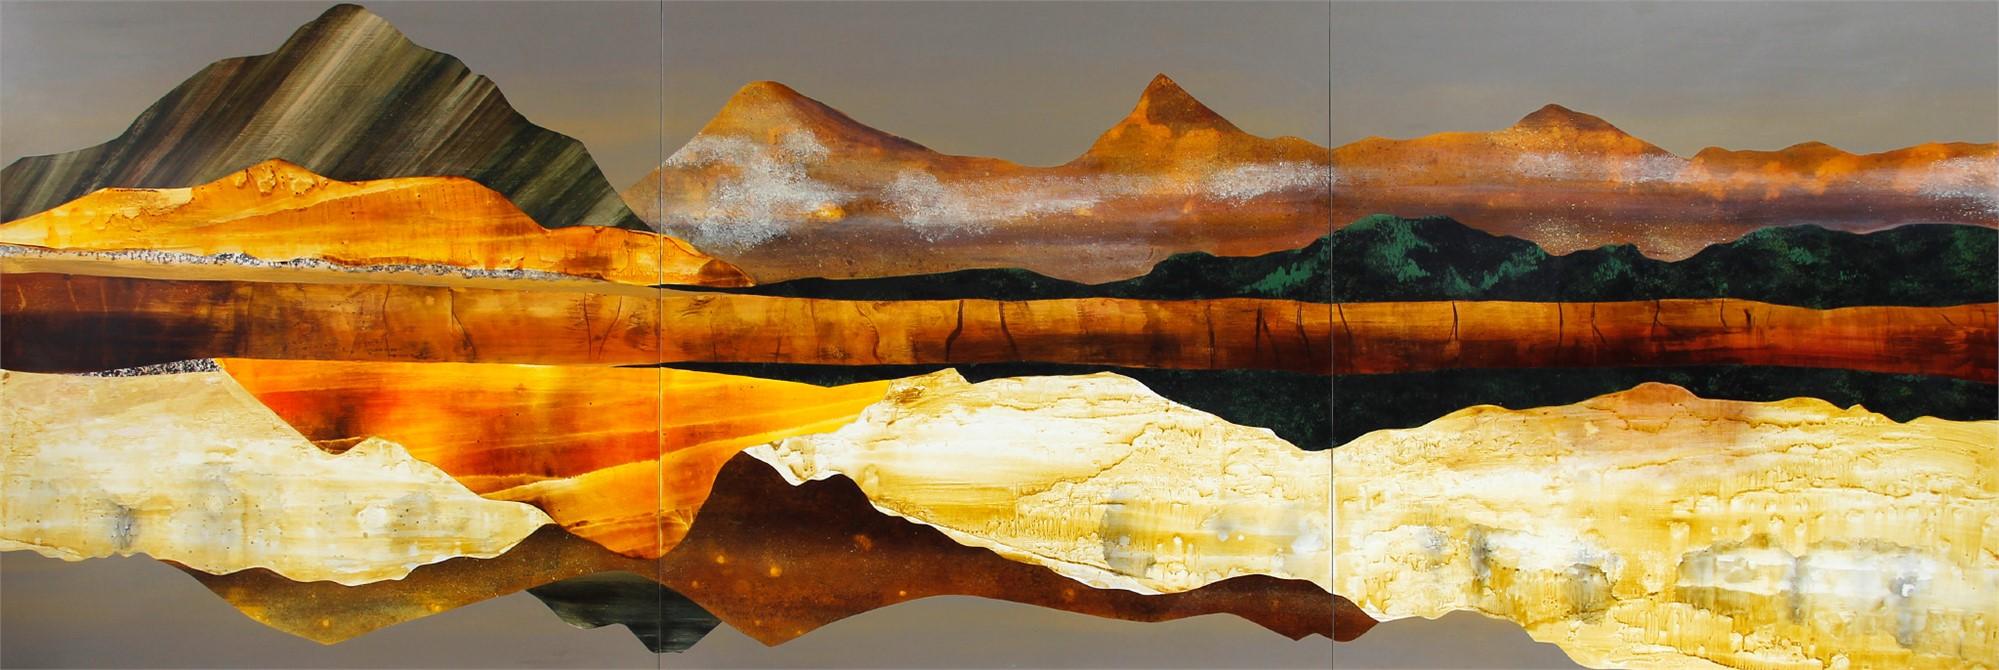 Front Range, Controlled Burn by Sarah Winkler